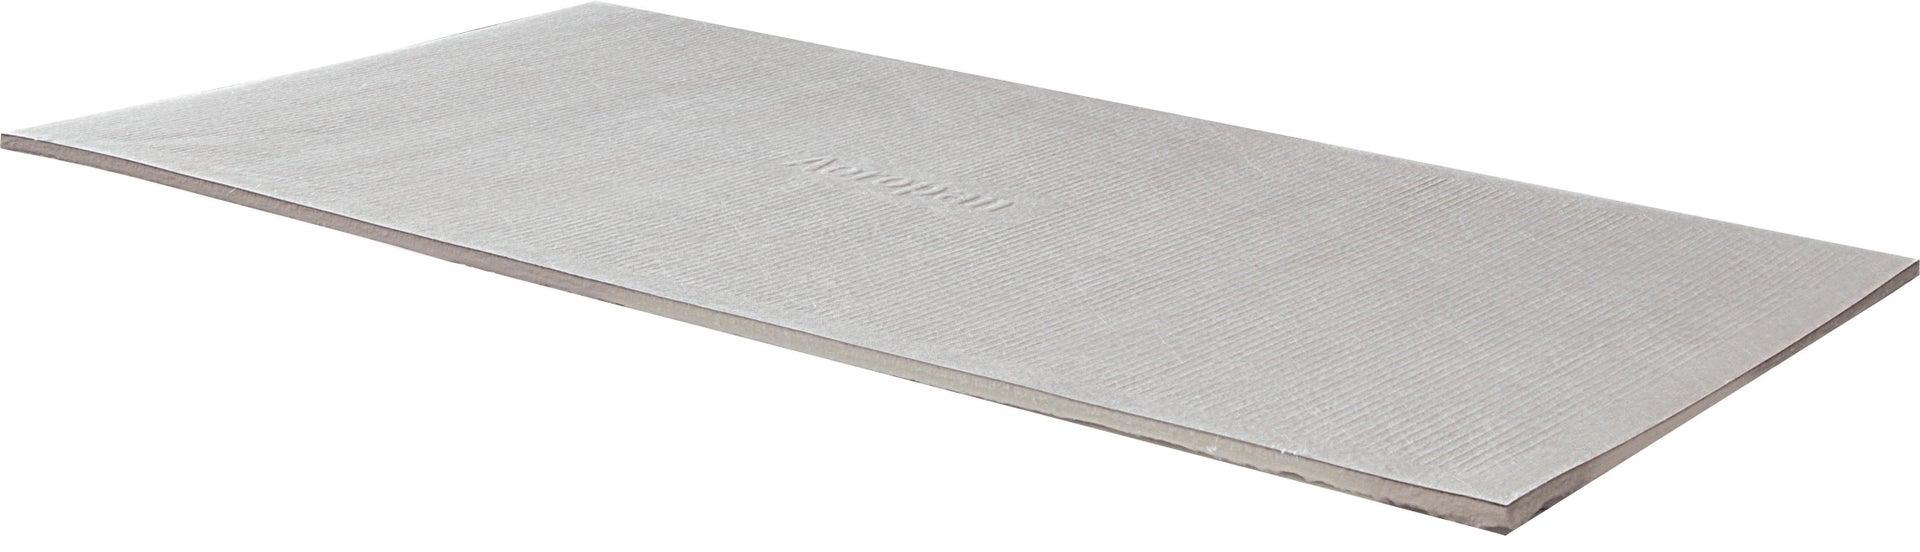 Pannello isolante Aeropan 0.72 x 1.4 m, Sp 6,00 mm